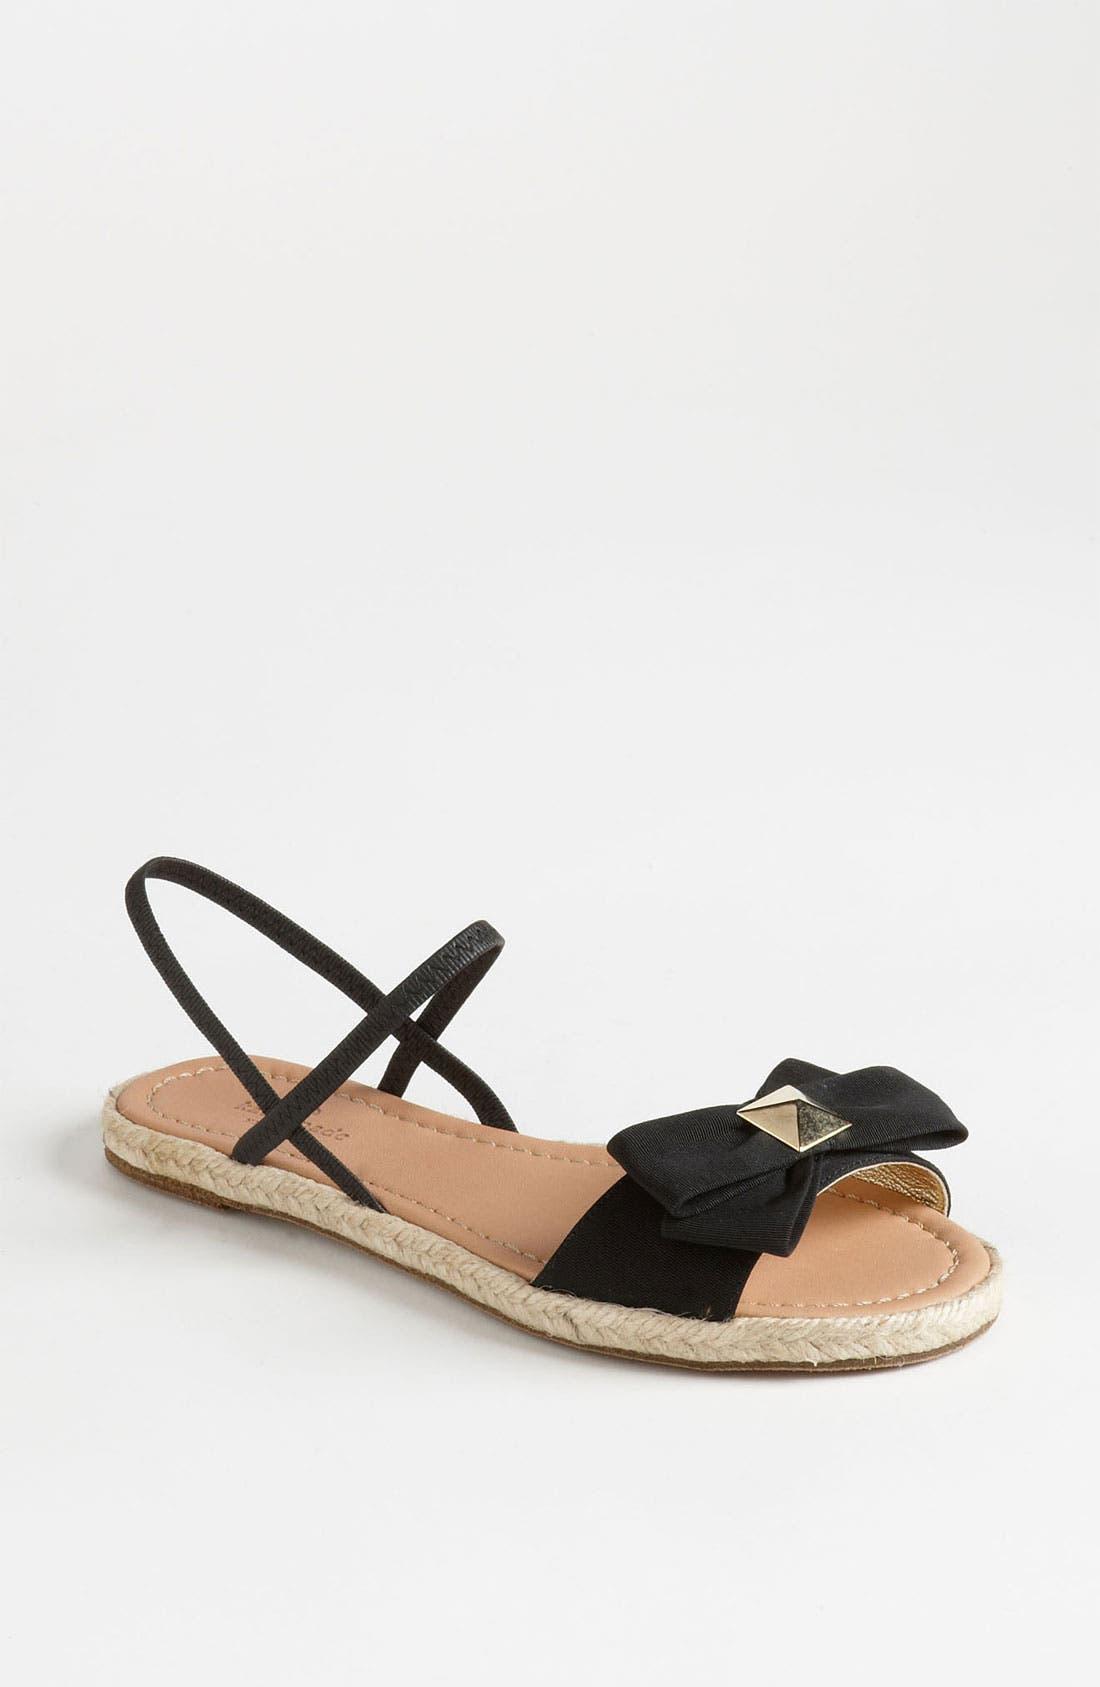 Main Image - kate spade new york 'cece' sandal